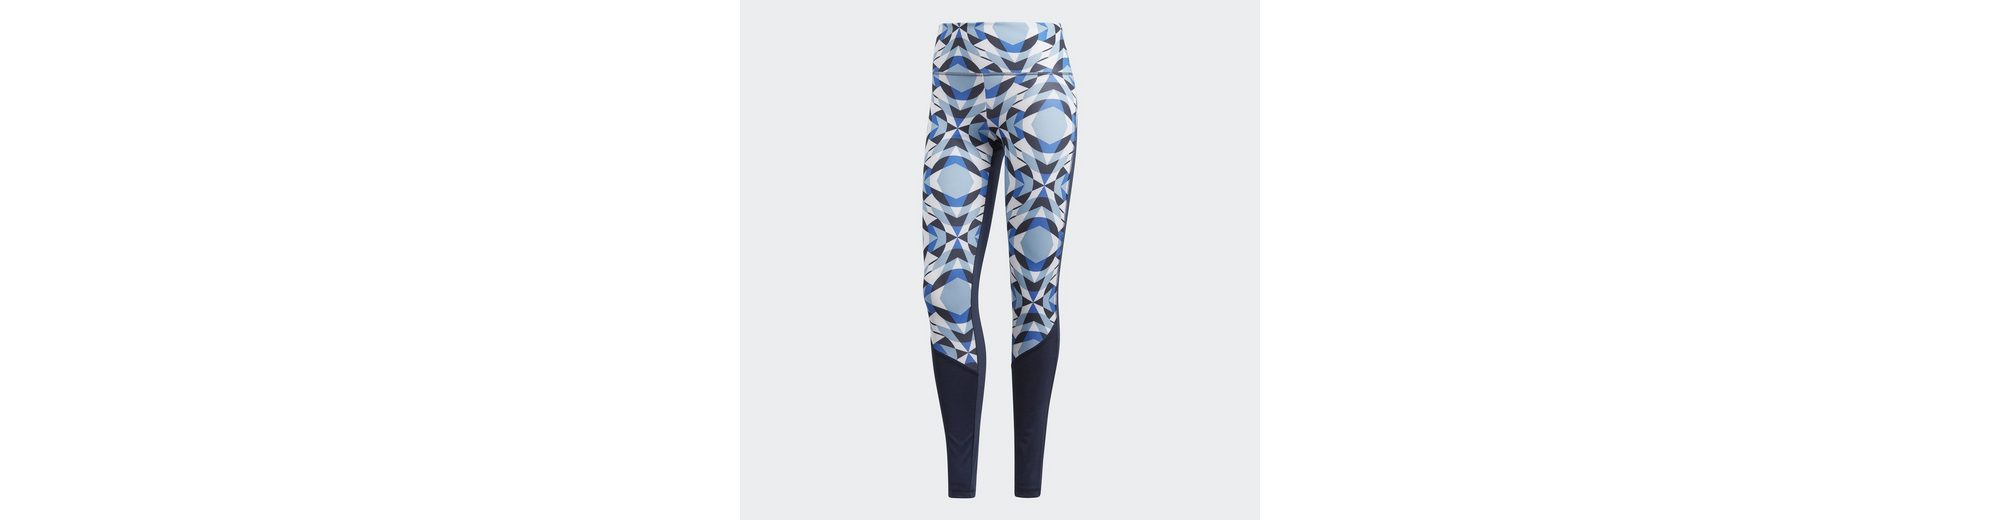 adidas Performance Leggings Wanderlust Yoga Tight Neue Günstig Kaufen Offiziellen Rabatt Sneakernews  Niedrigere Preise ly8PILg